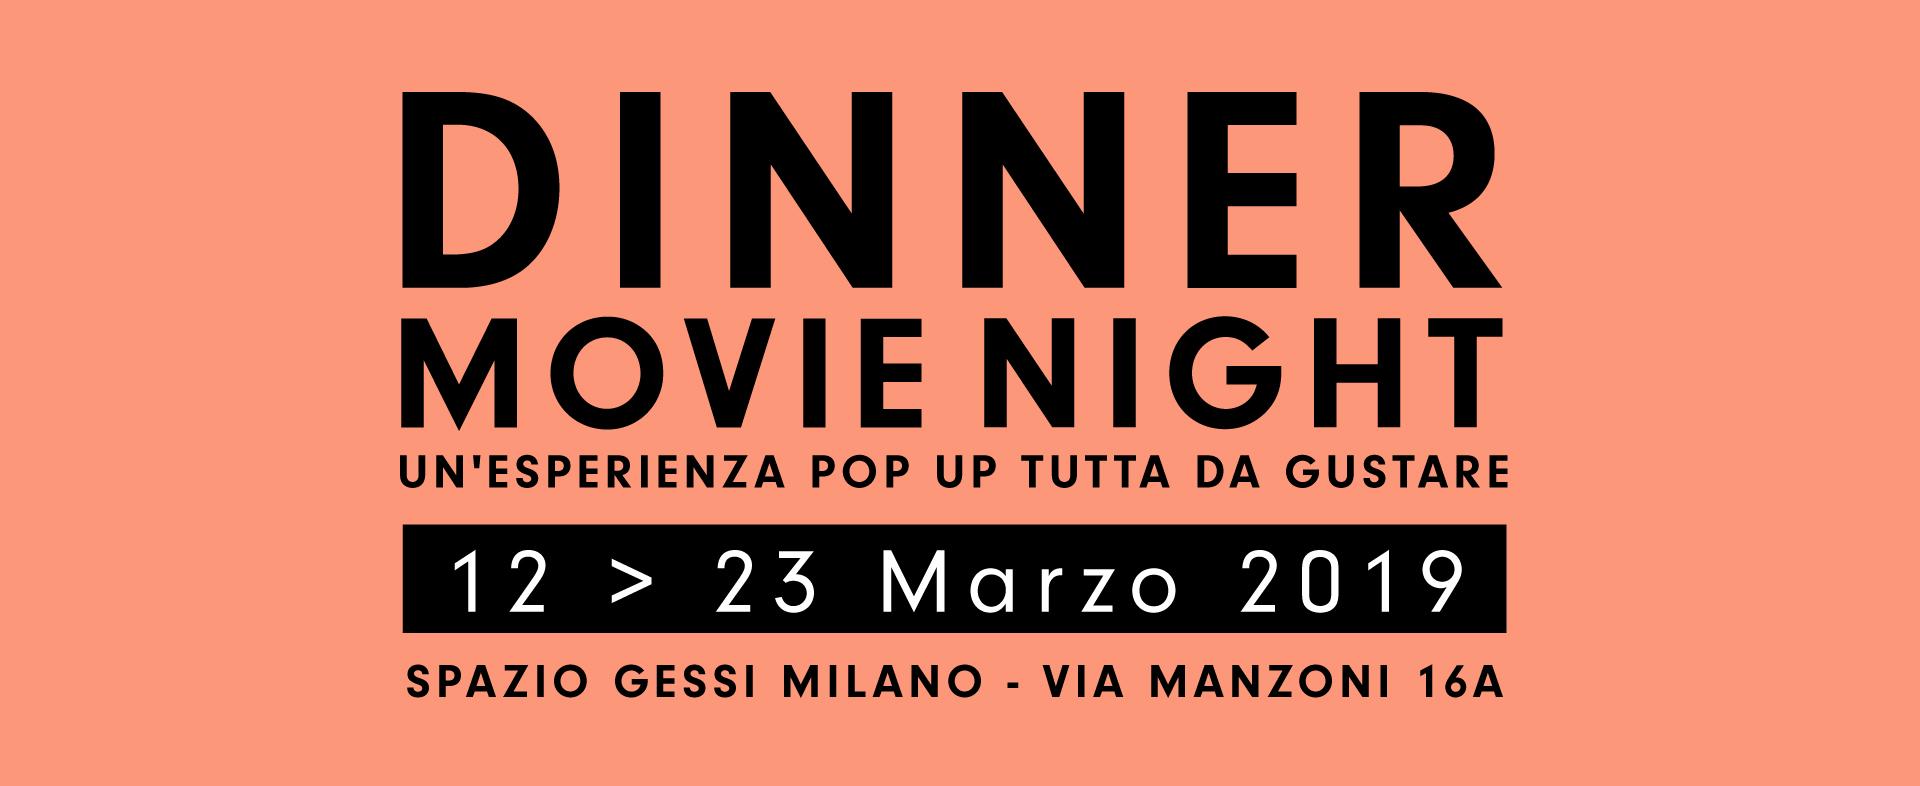 dinner-movie-night